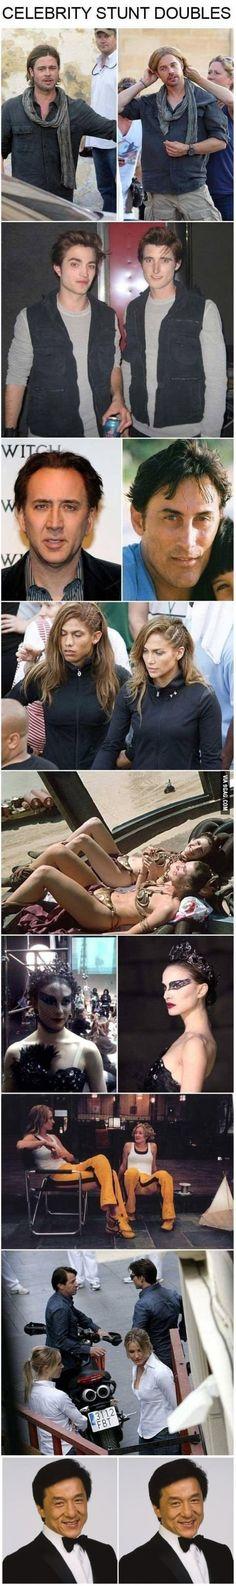 Celebrity Stunt Doubles #celebrities #movie